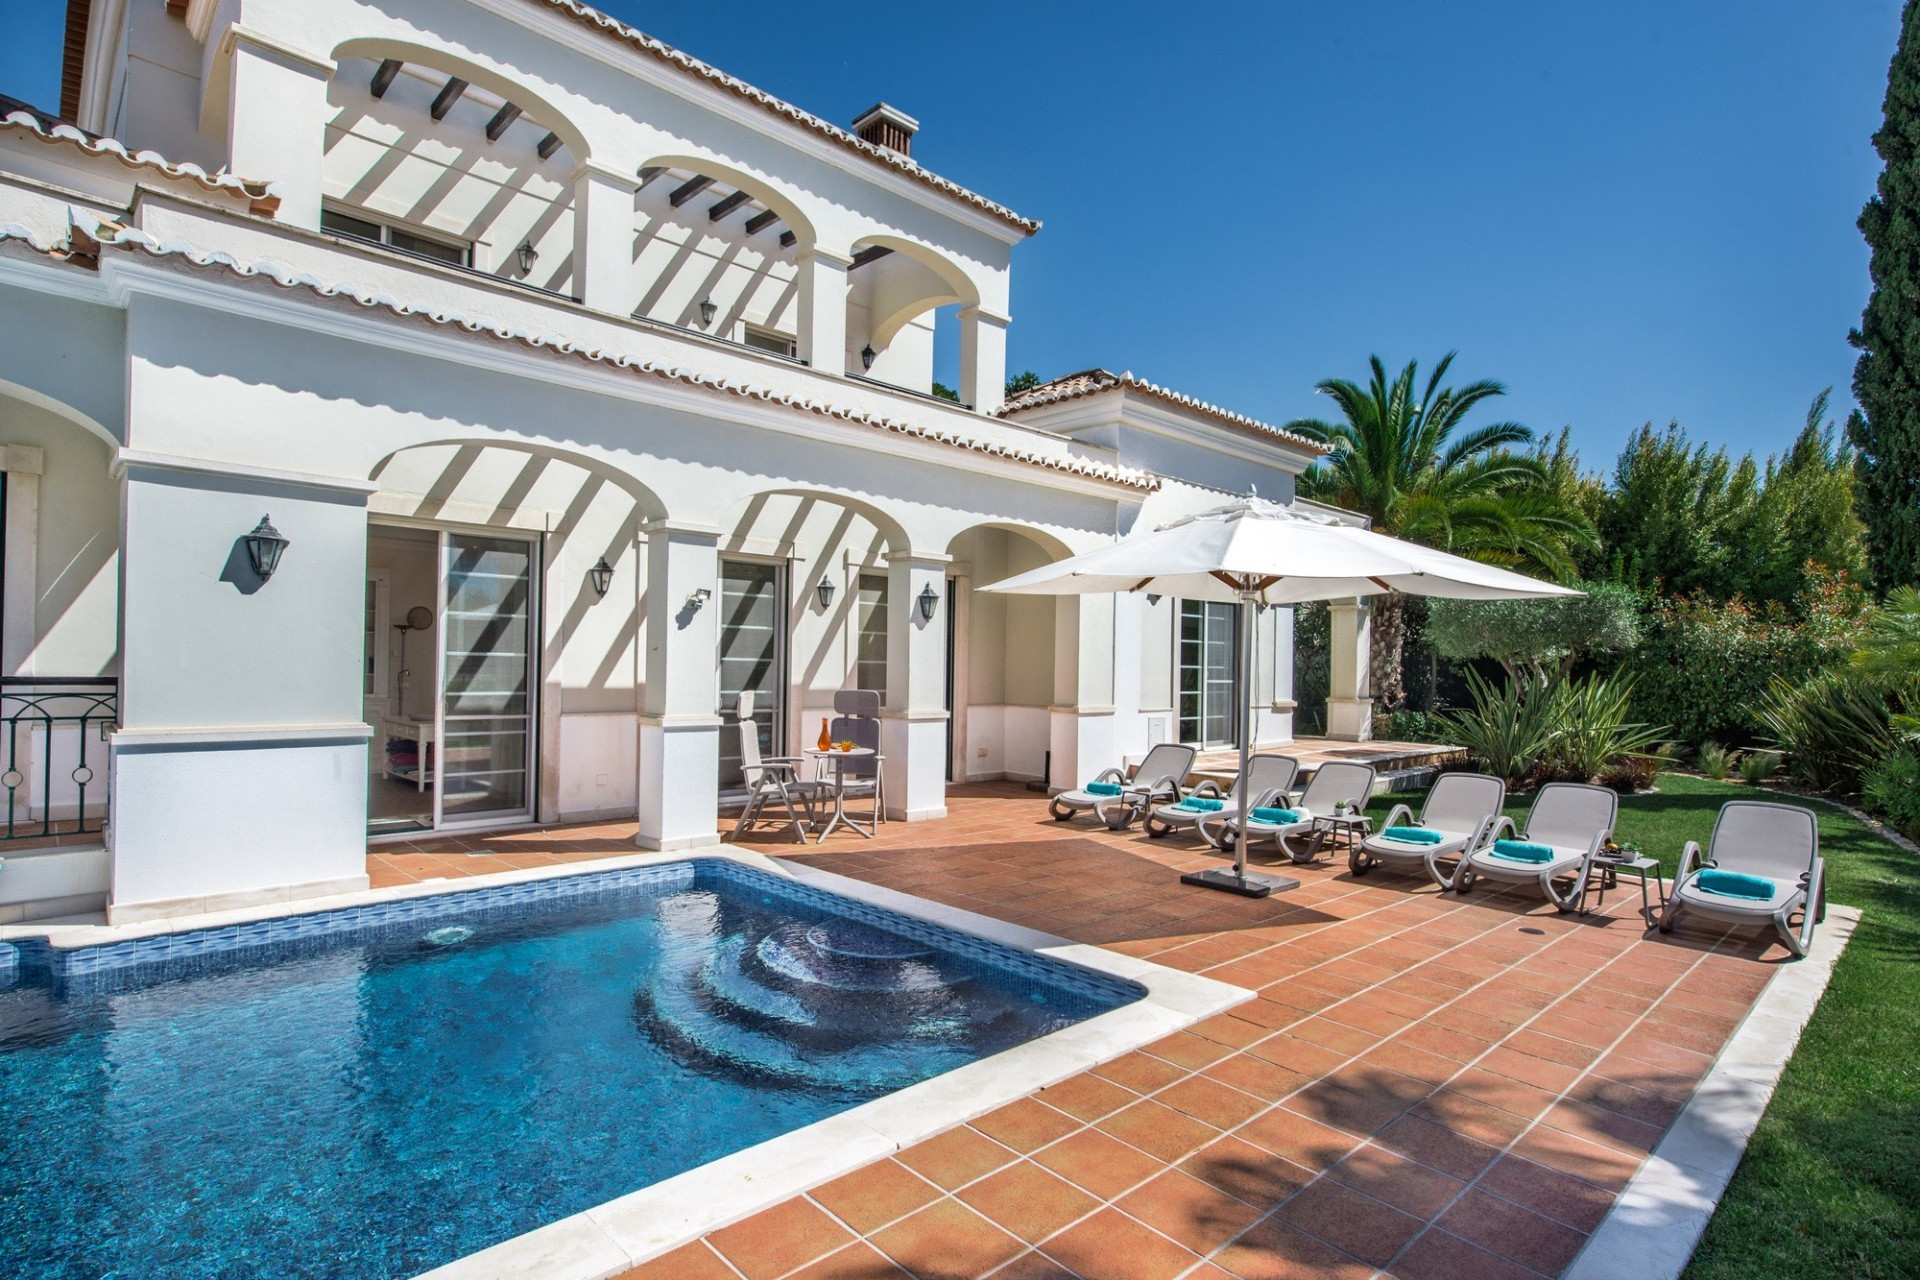 Luxury 4 bedroom villa for rent Algarve large villas to rent algarve